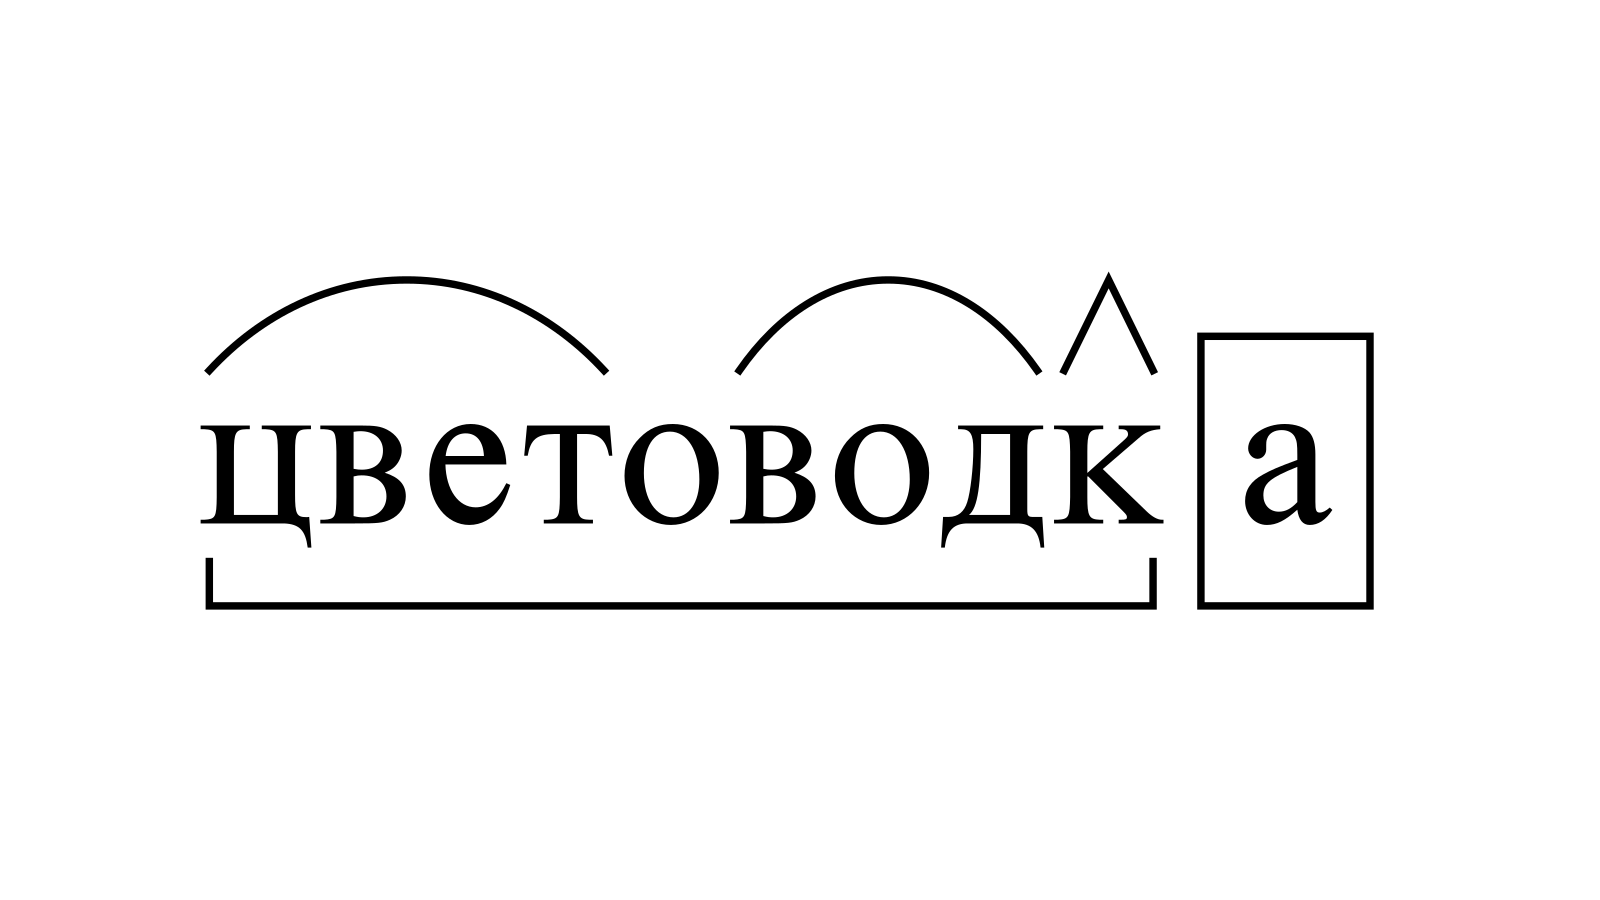 Разбор слова «цветоводка» по составу